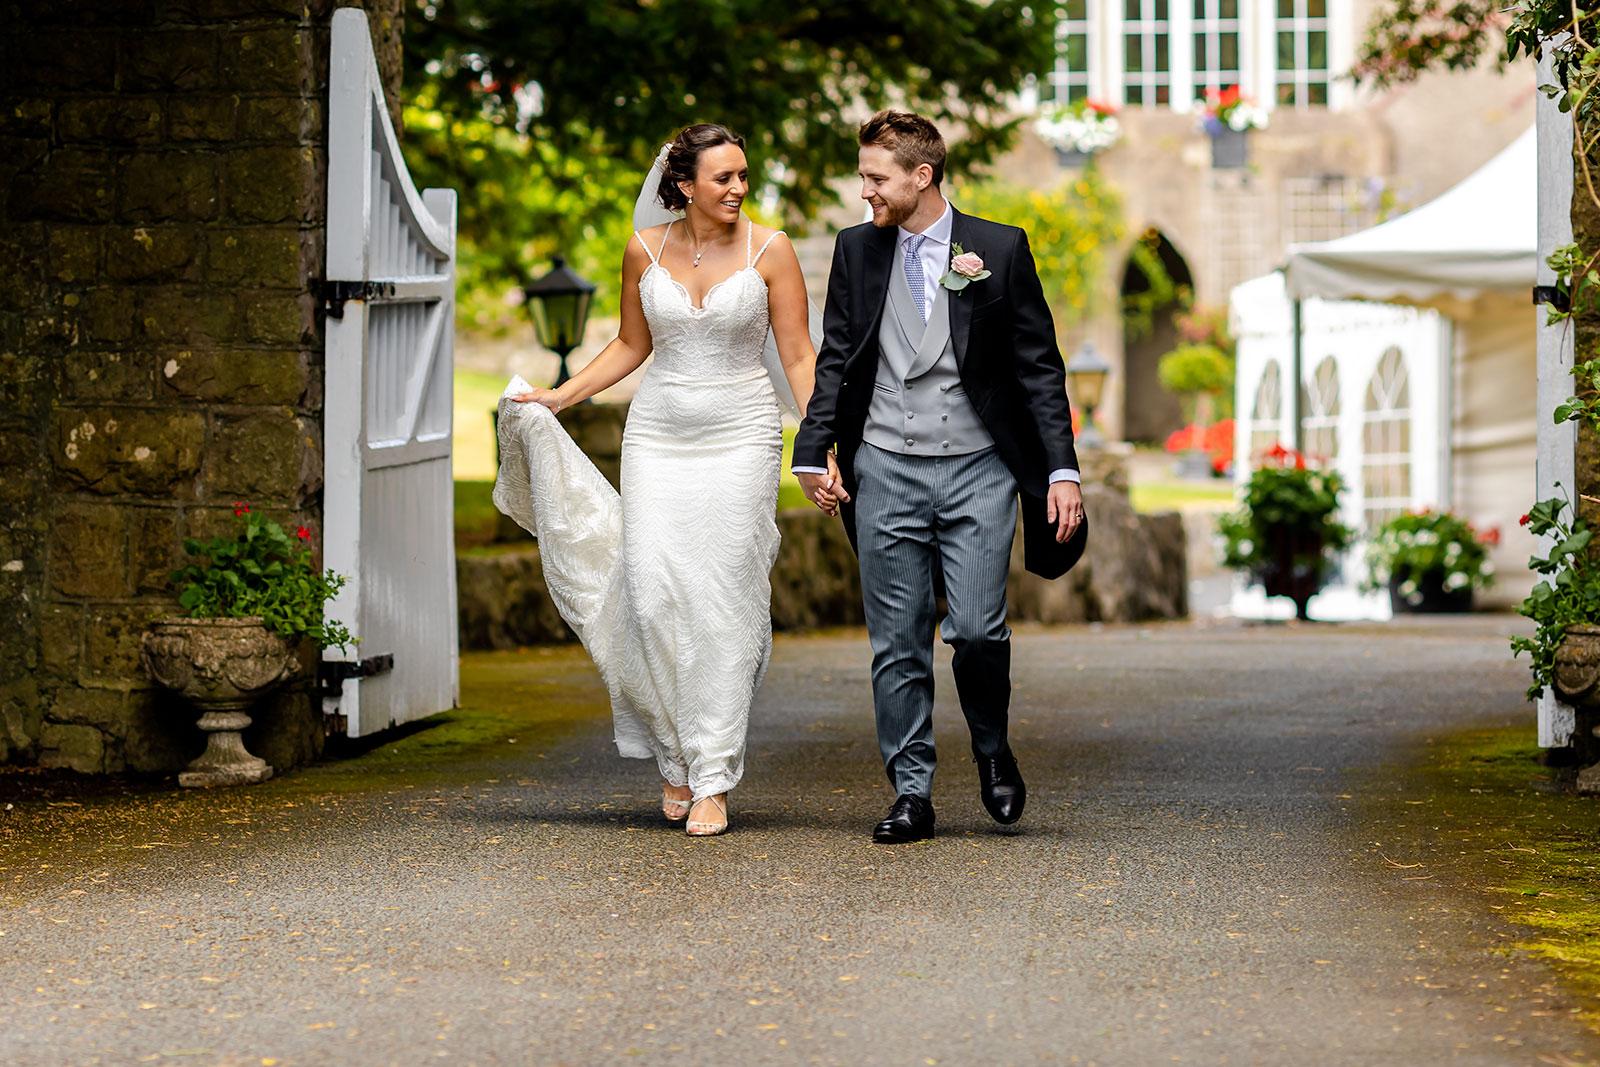 Fonmon Castle Wedding - Bride and Groom portrait